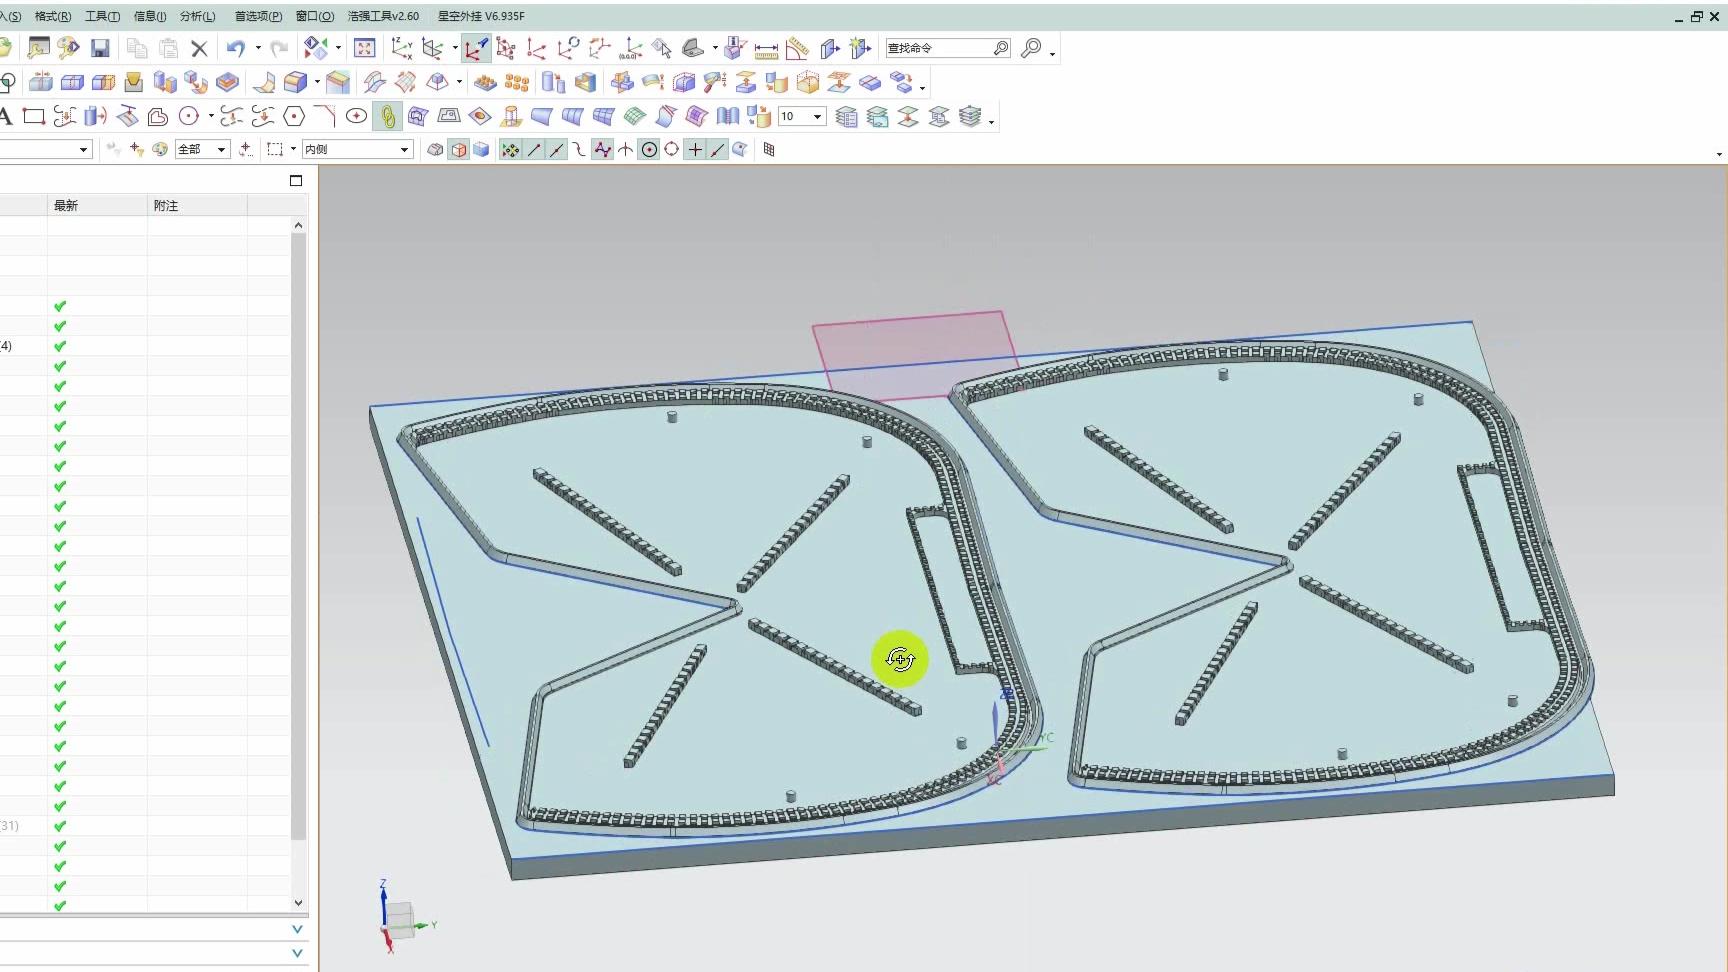 UG编程口罩机做平面刀路关键展平方法!-点冠教育